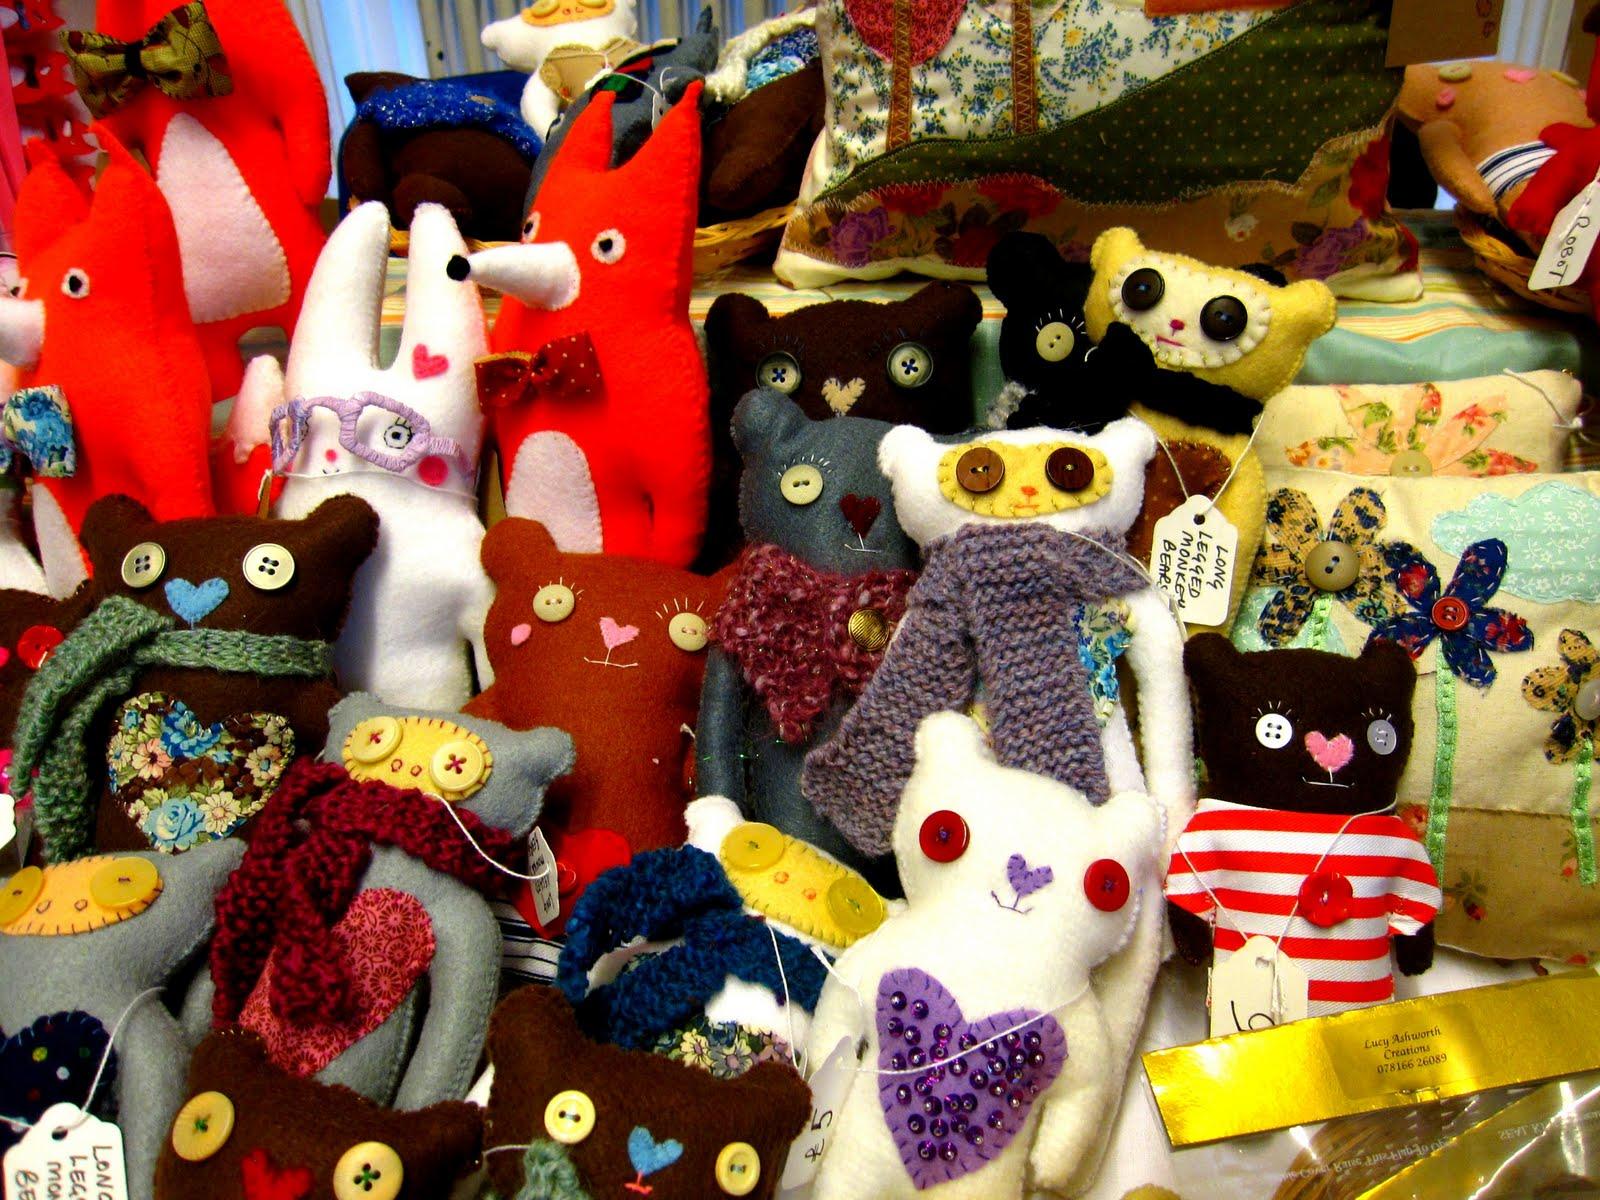 Little things i make christmas craft fair 1 for Things to make for christmas craft fairs